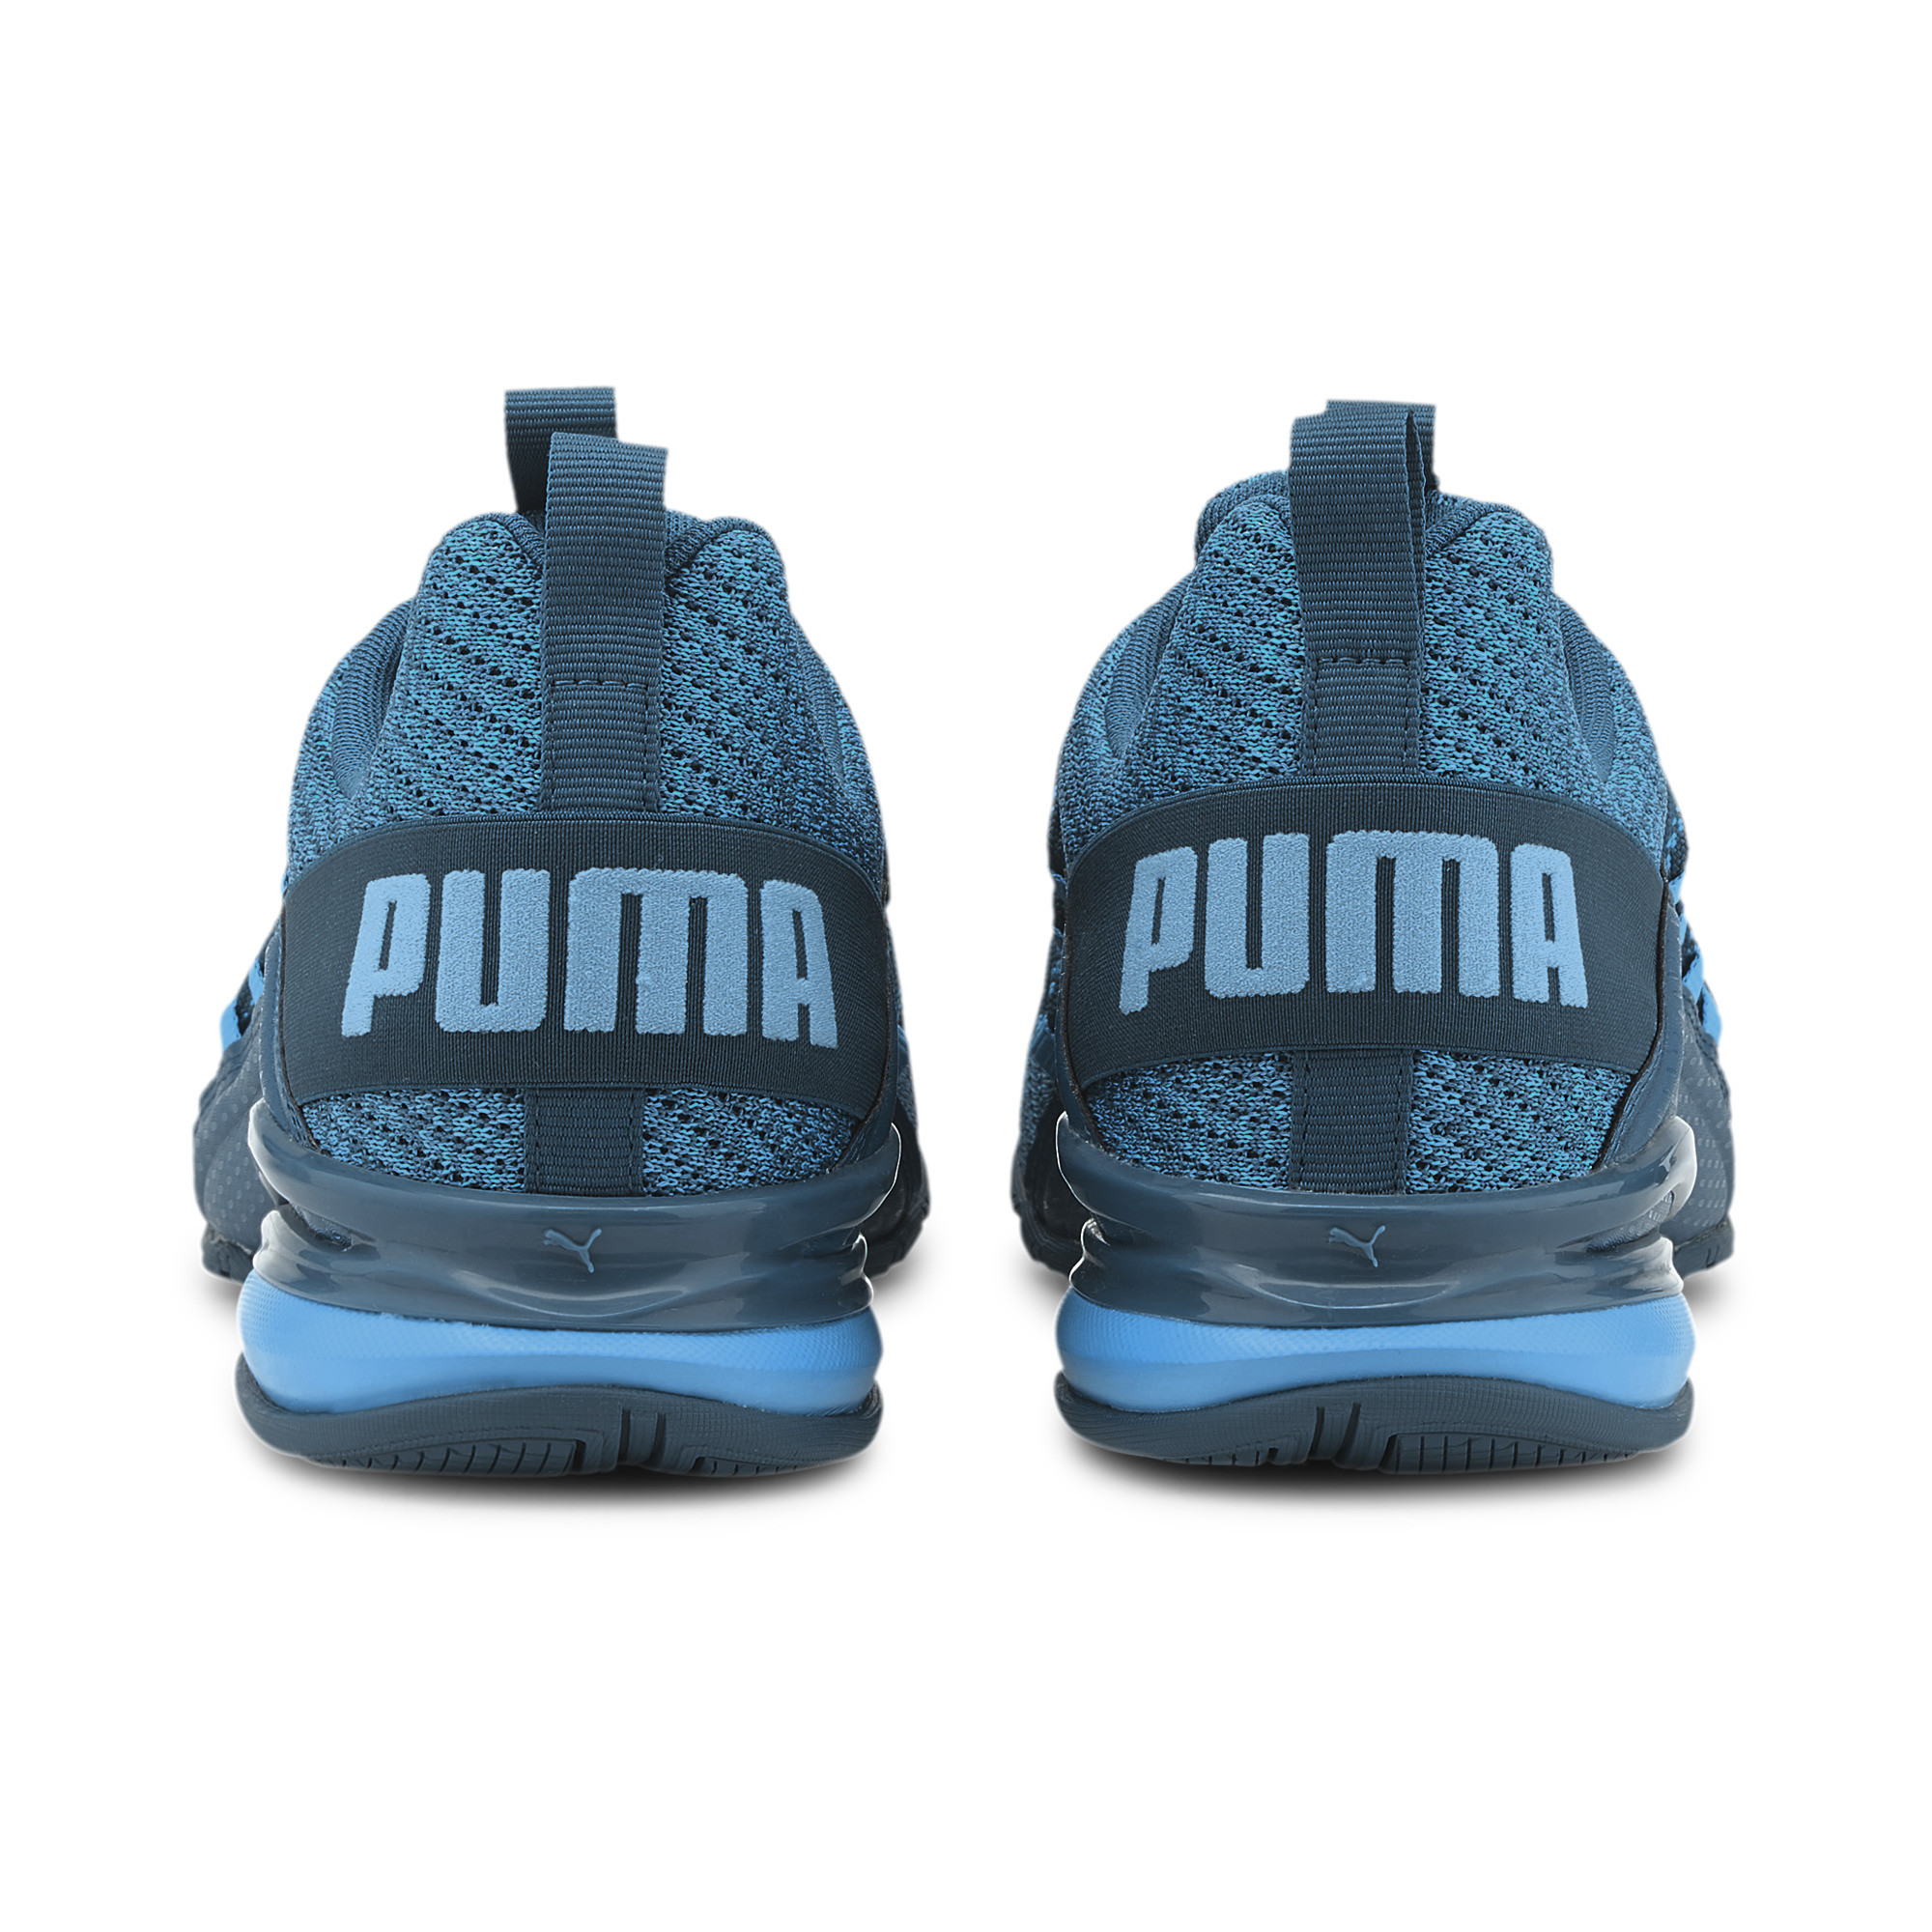 PUMA-Men-039-s-Axelion-Ultra-Running-Shoes thumbnail 17